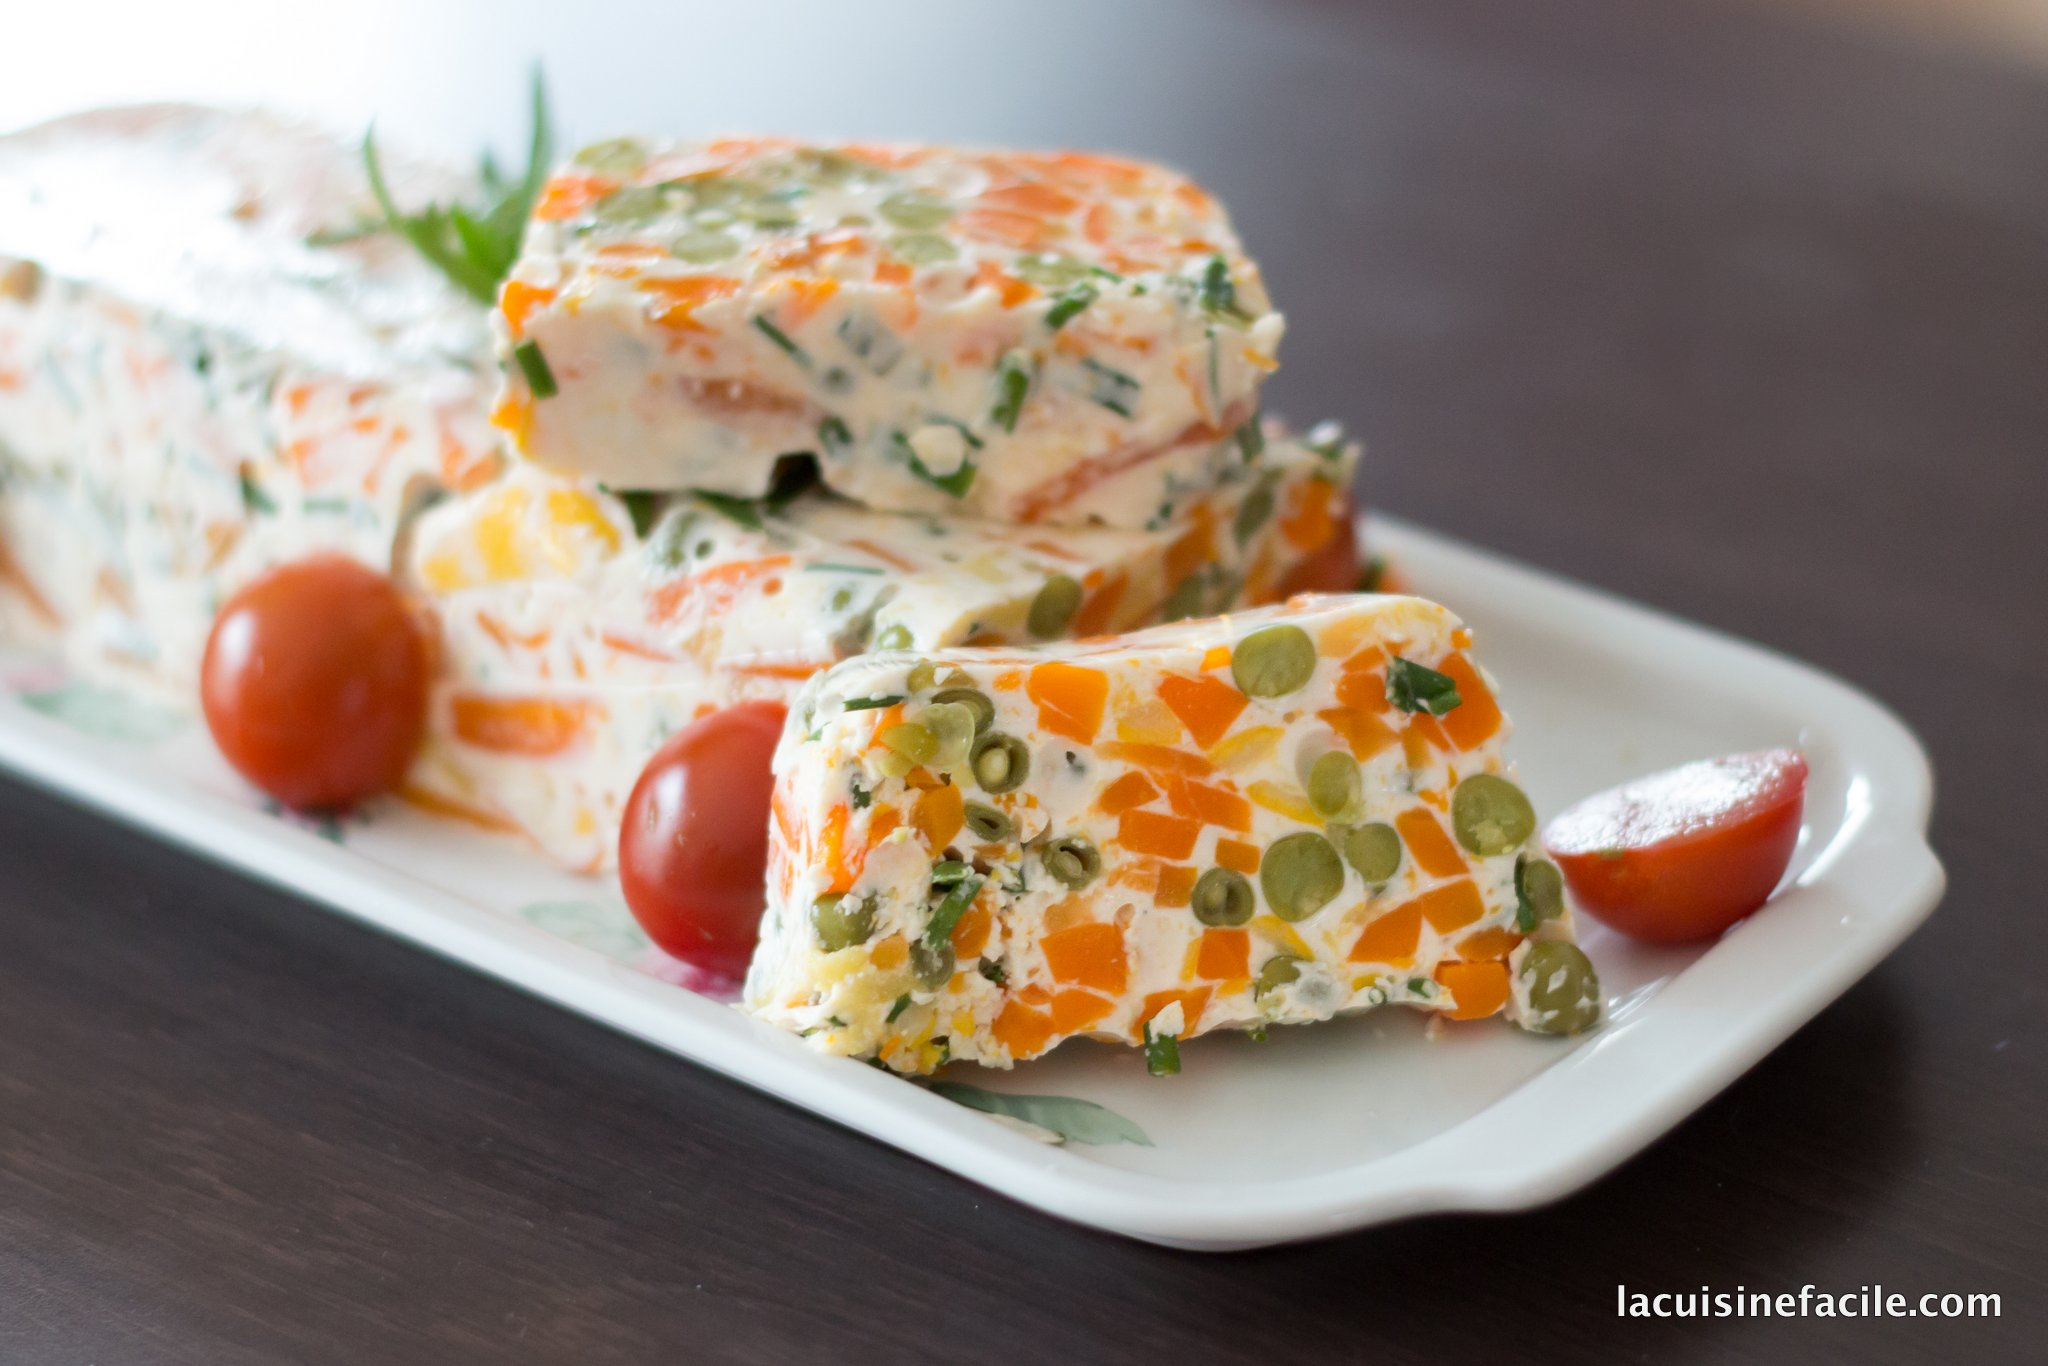 terrine-printaniere-aux-legumes-2